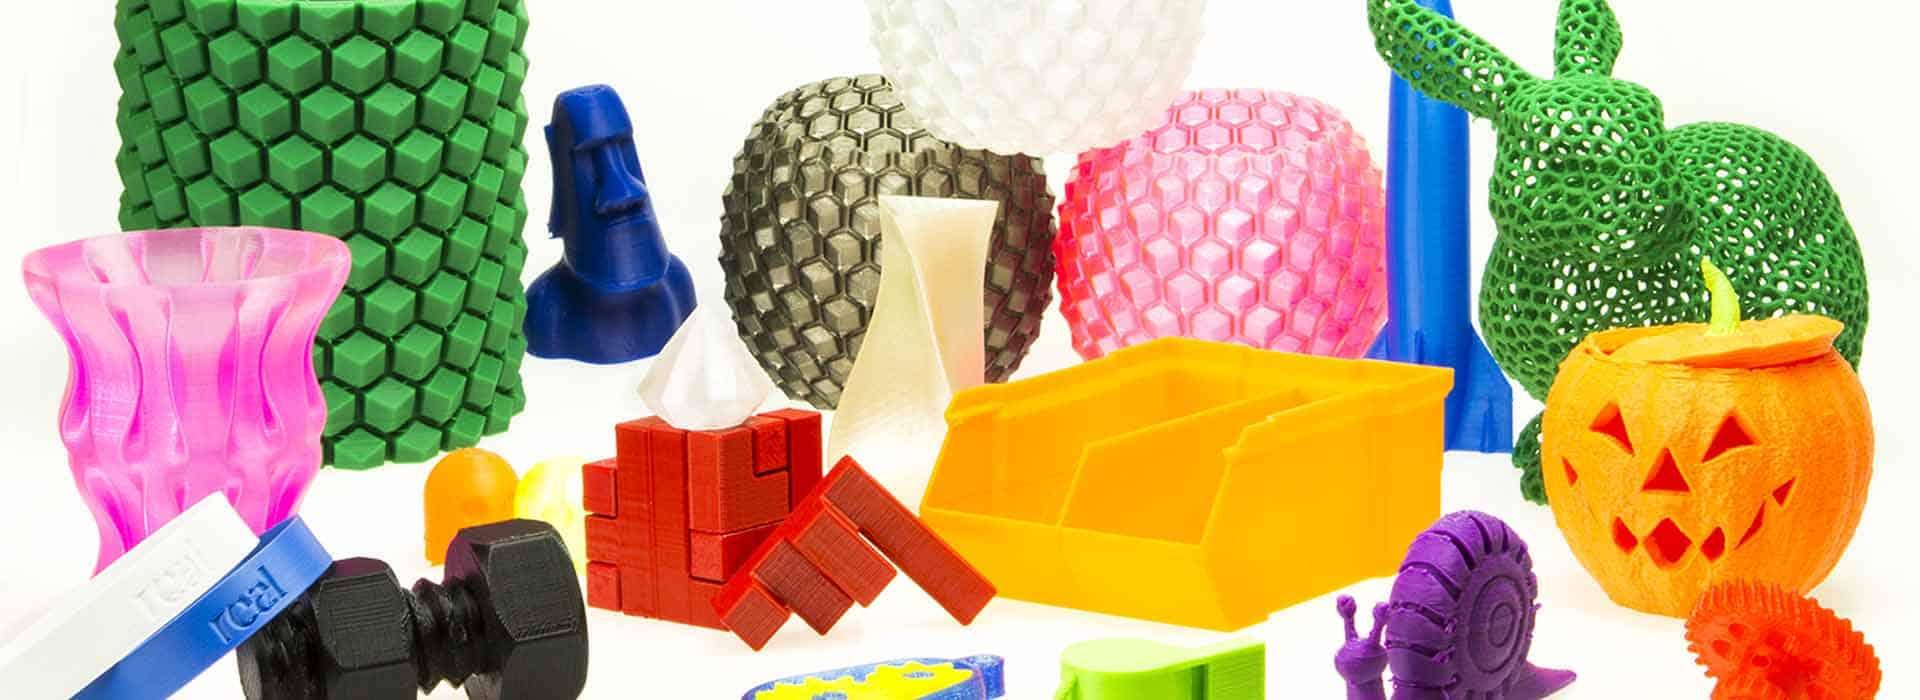 3D Printer Materials Guide